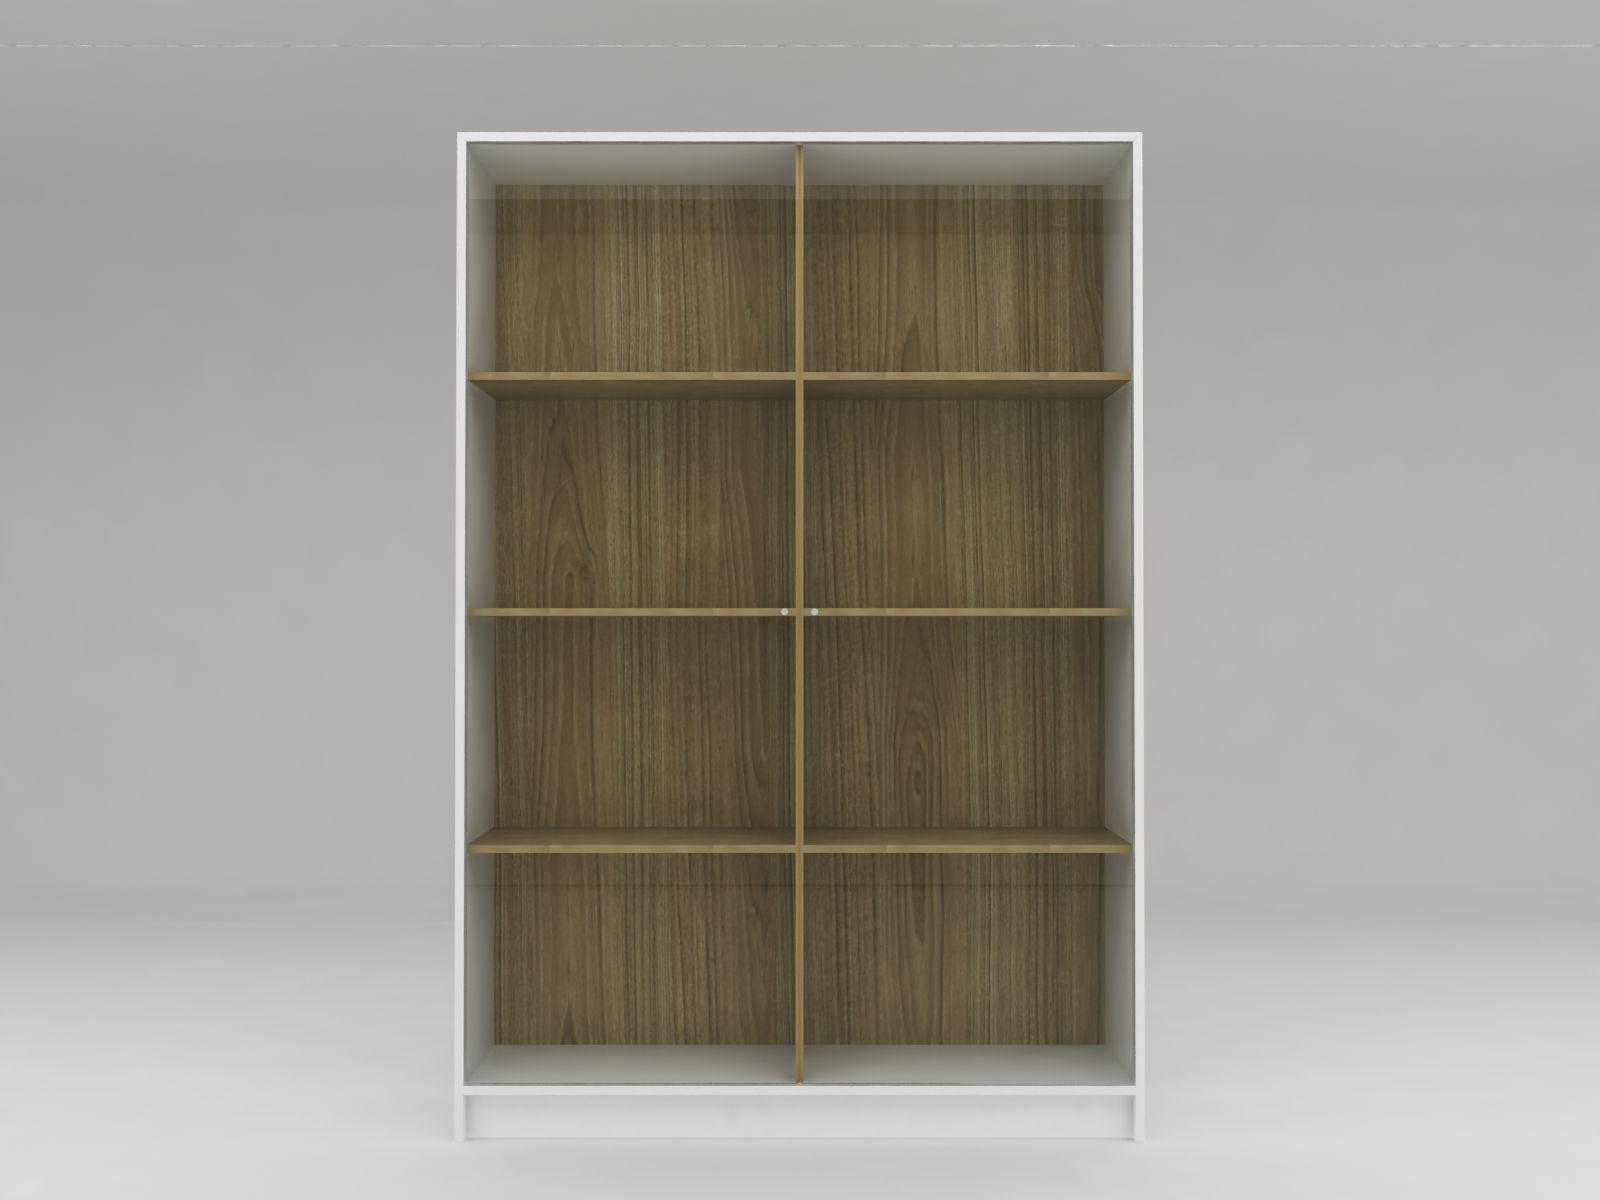 Minimalist Modern Furniture Lemari Sepatu Kaca Minimalis White